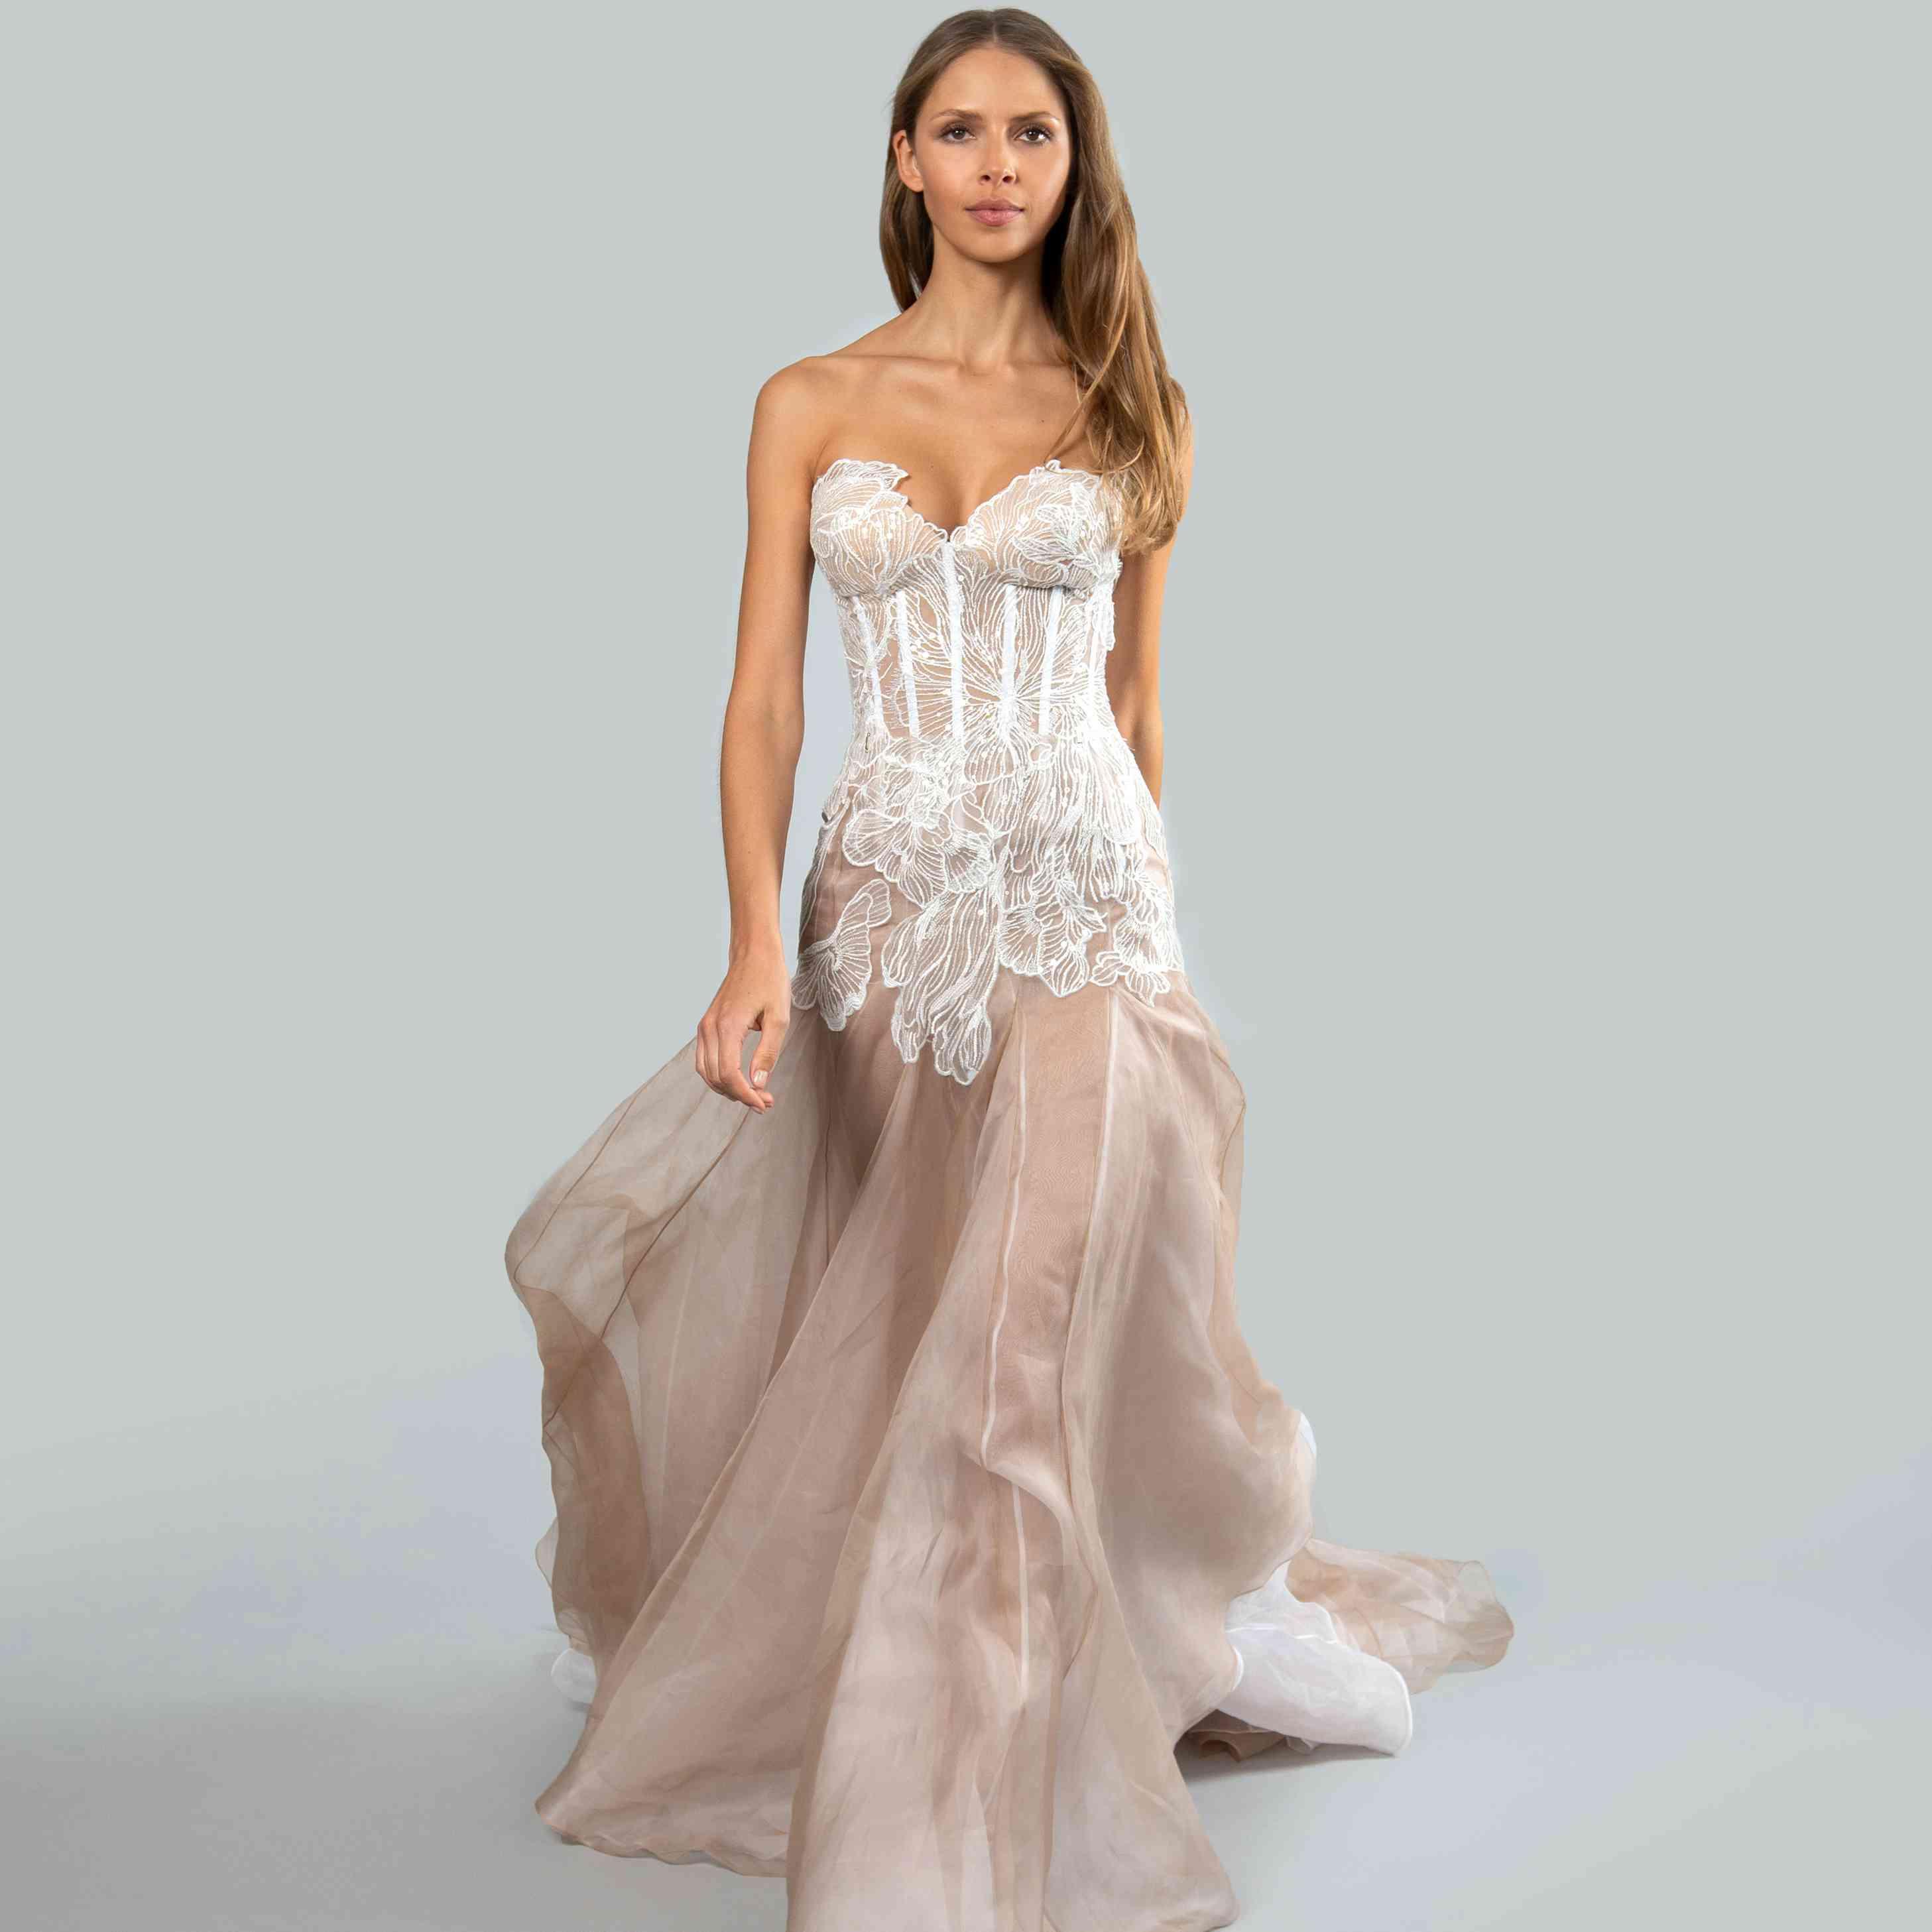 Model in strapless sweetheart corset wedding dress